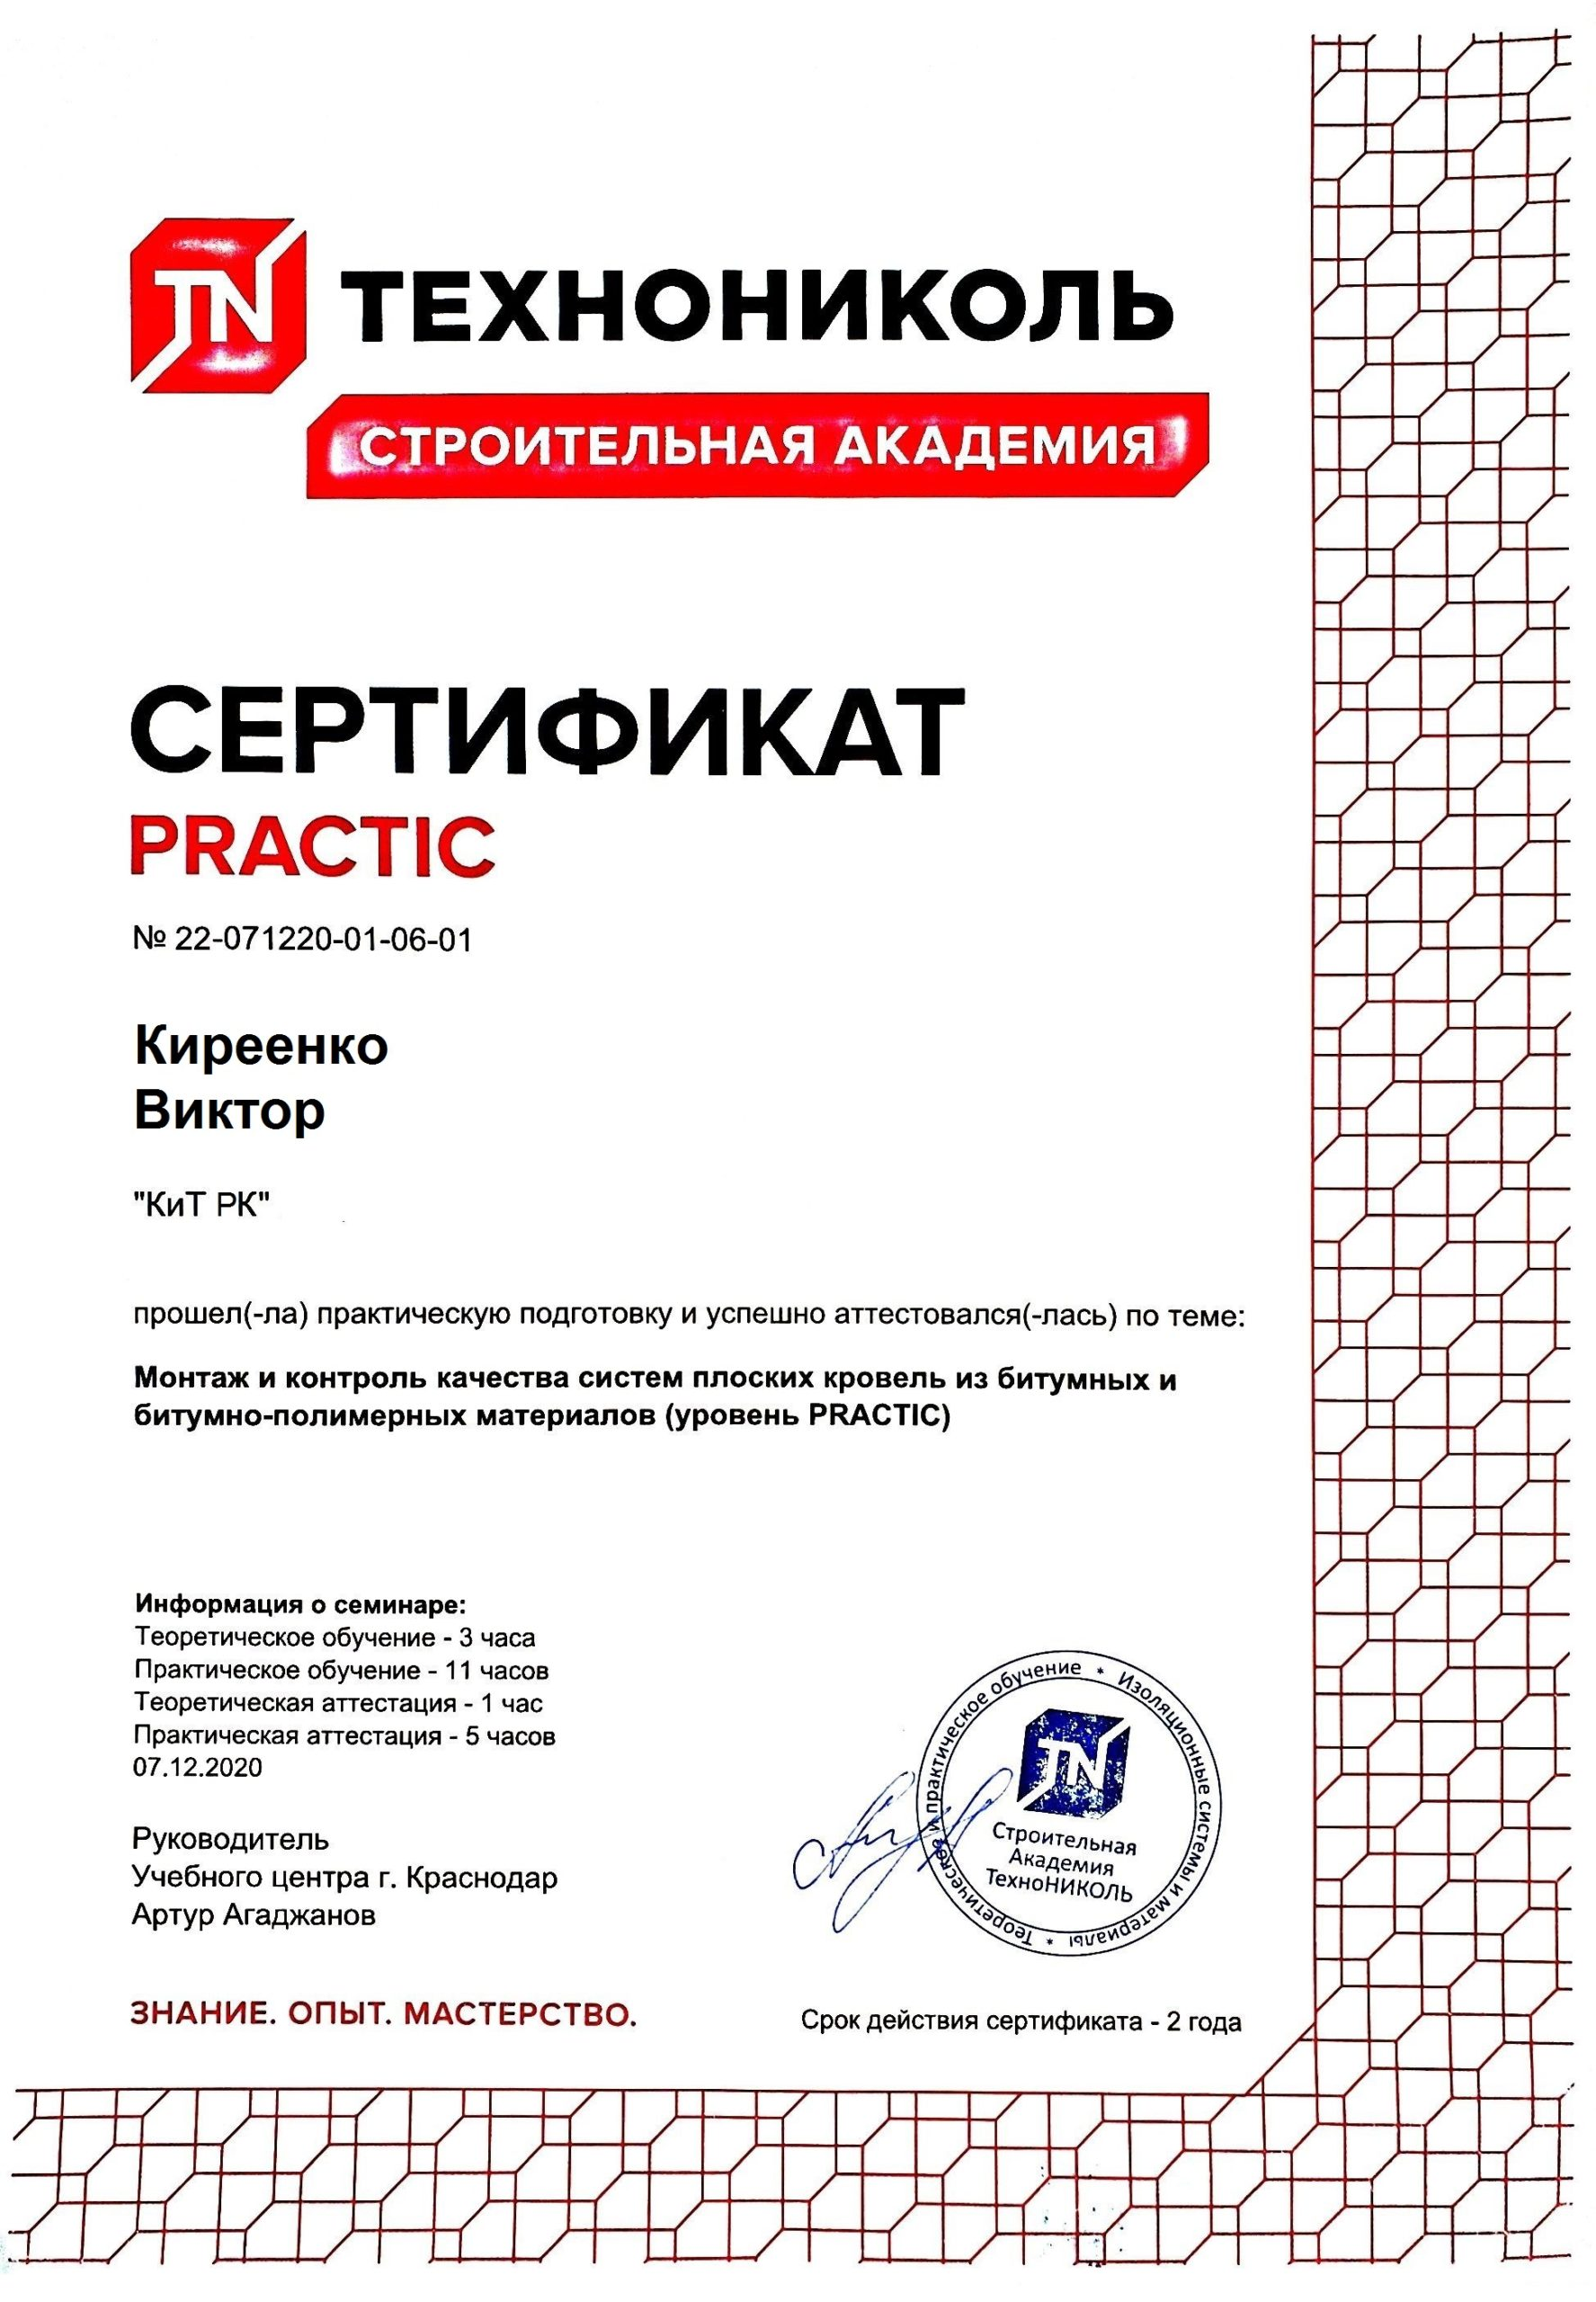 Сертификат виктор